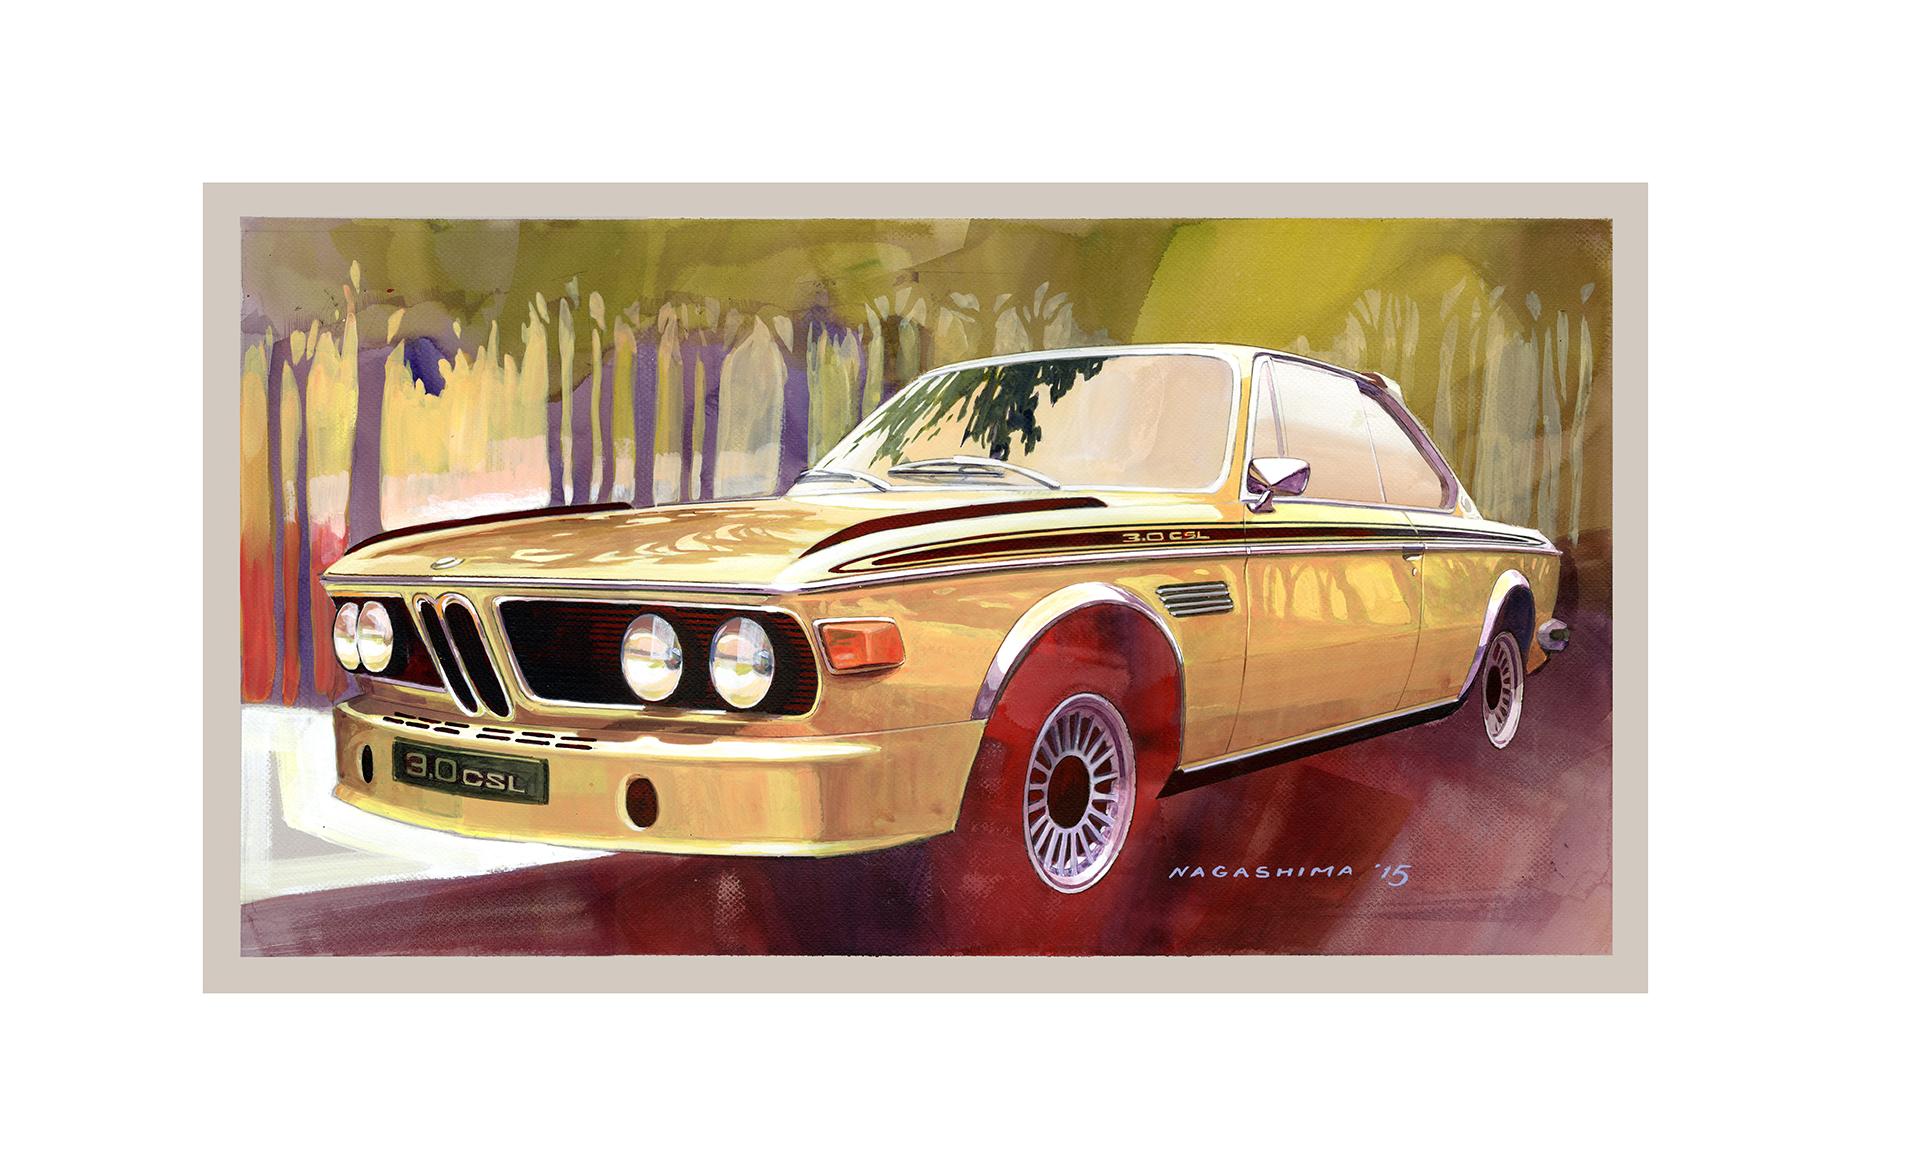 BMW 3.0 CS - artwork